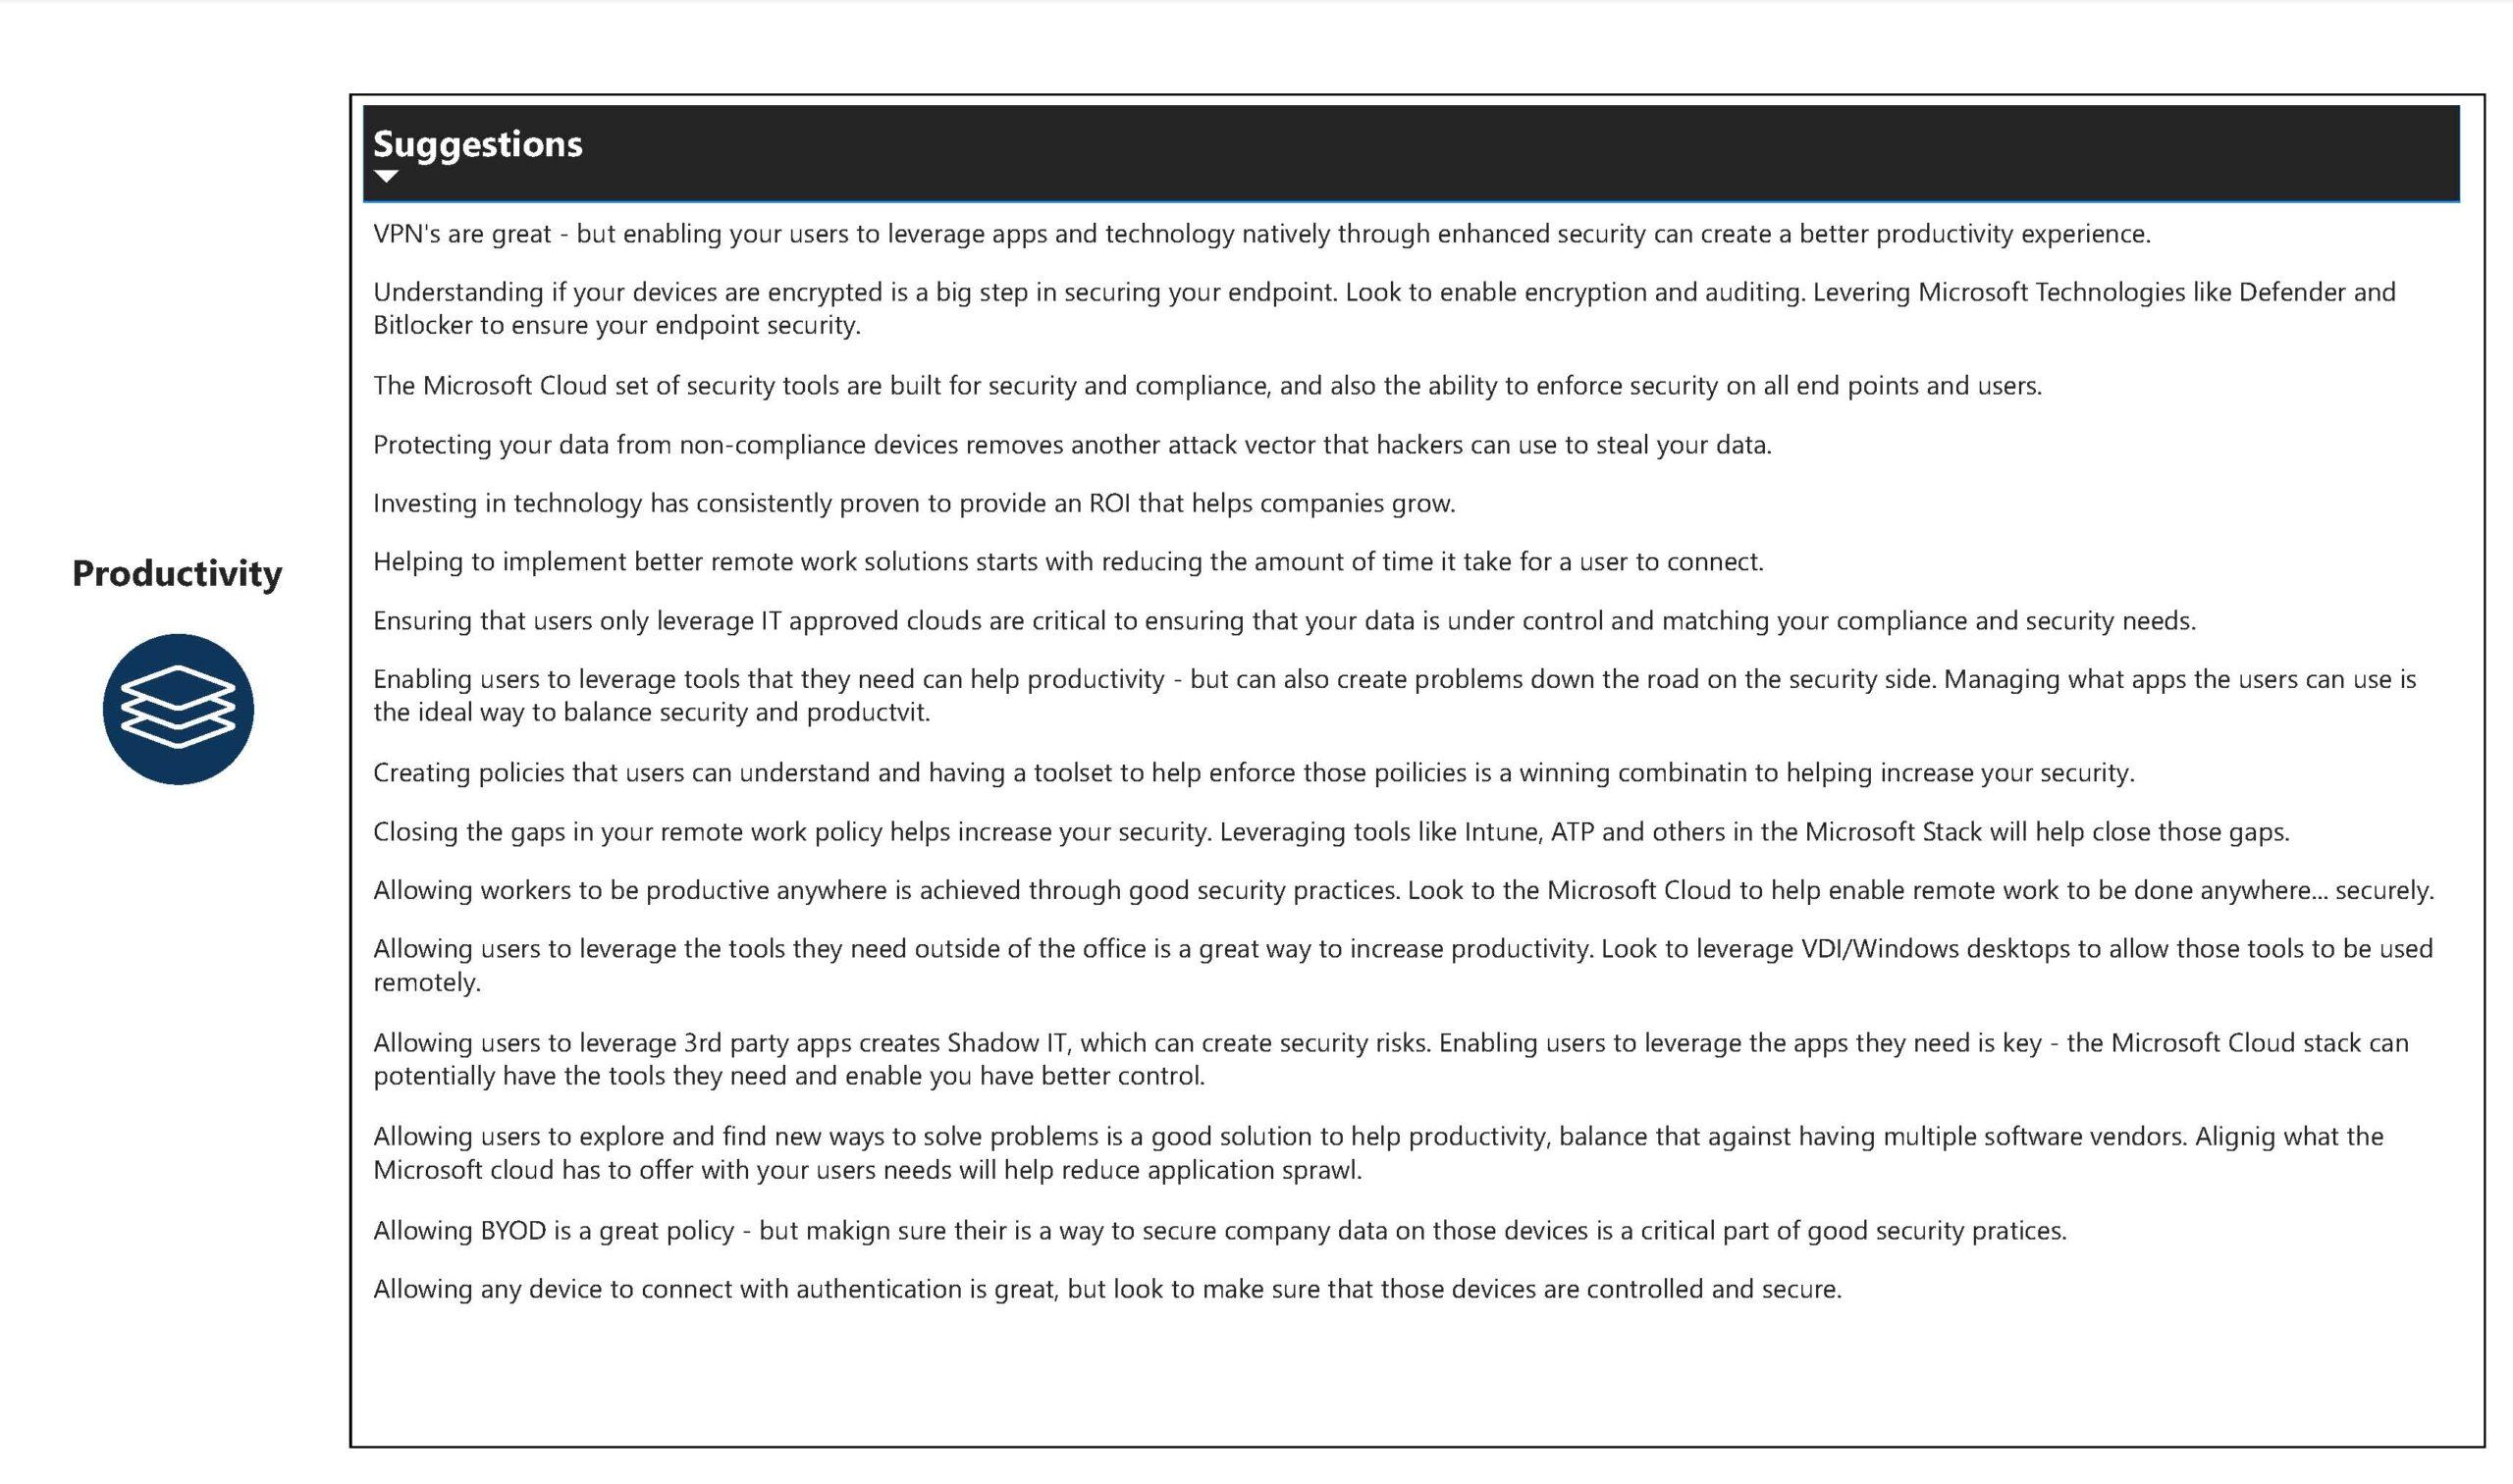 RWF Report V3 -page 3